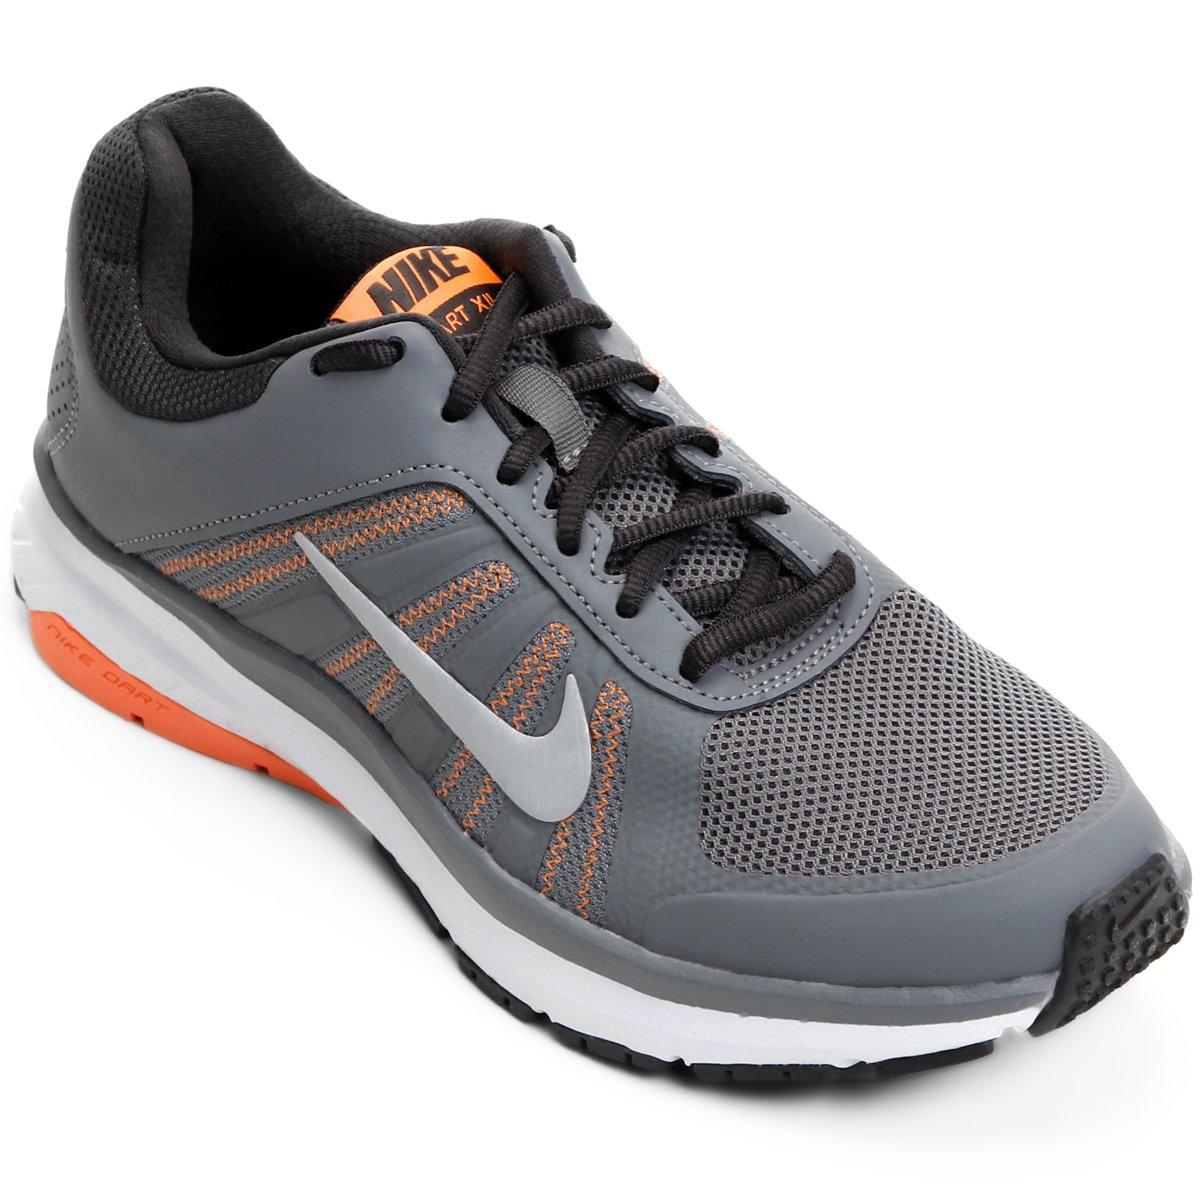 6cef53aadf Tênis Nike Dart 12 MSL Feminino - Violeta e Branco | Netshoes